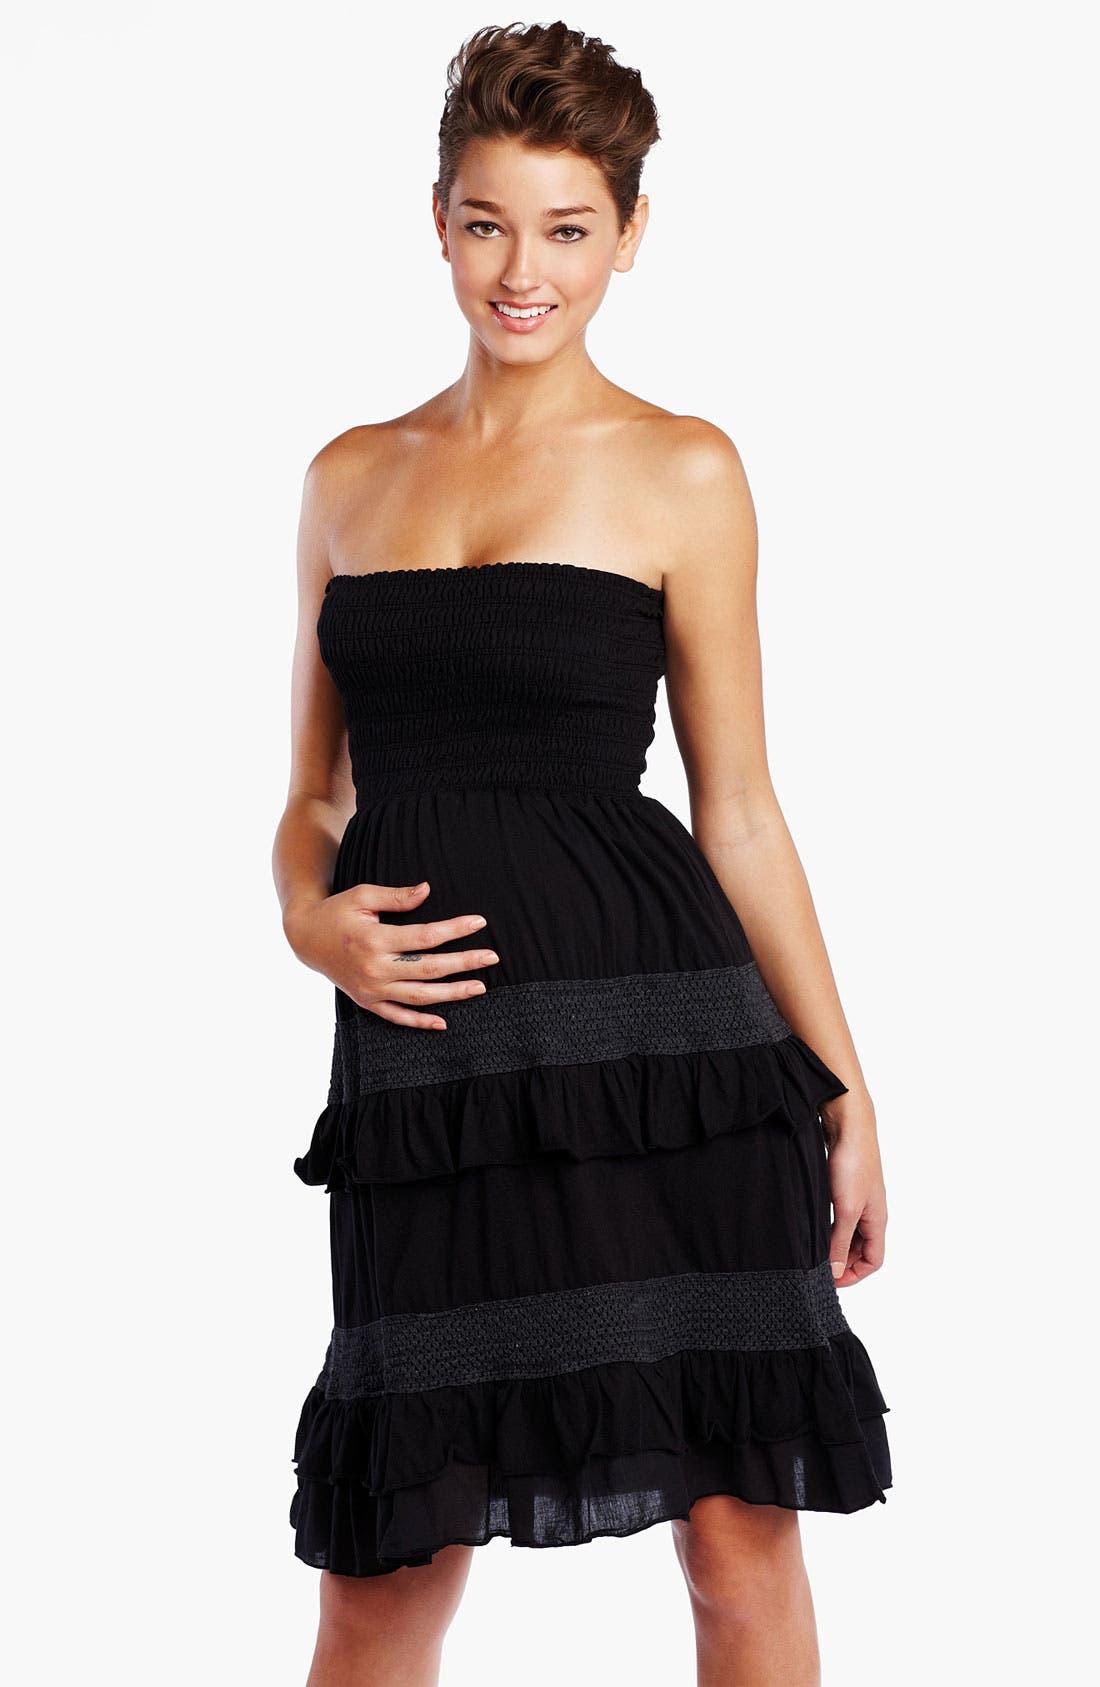 Alternate Image 1 Selected - Maternal America Convertible Crochet Maternity Dress